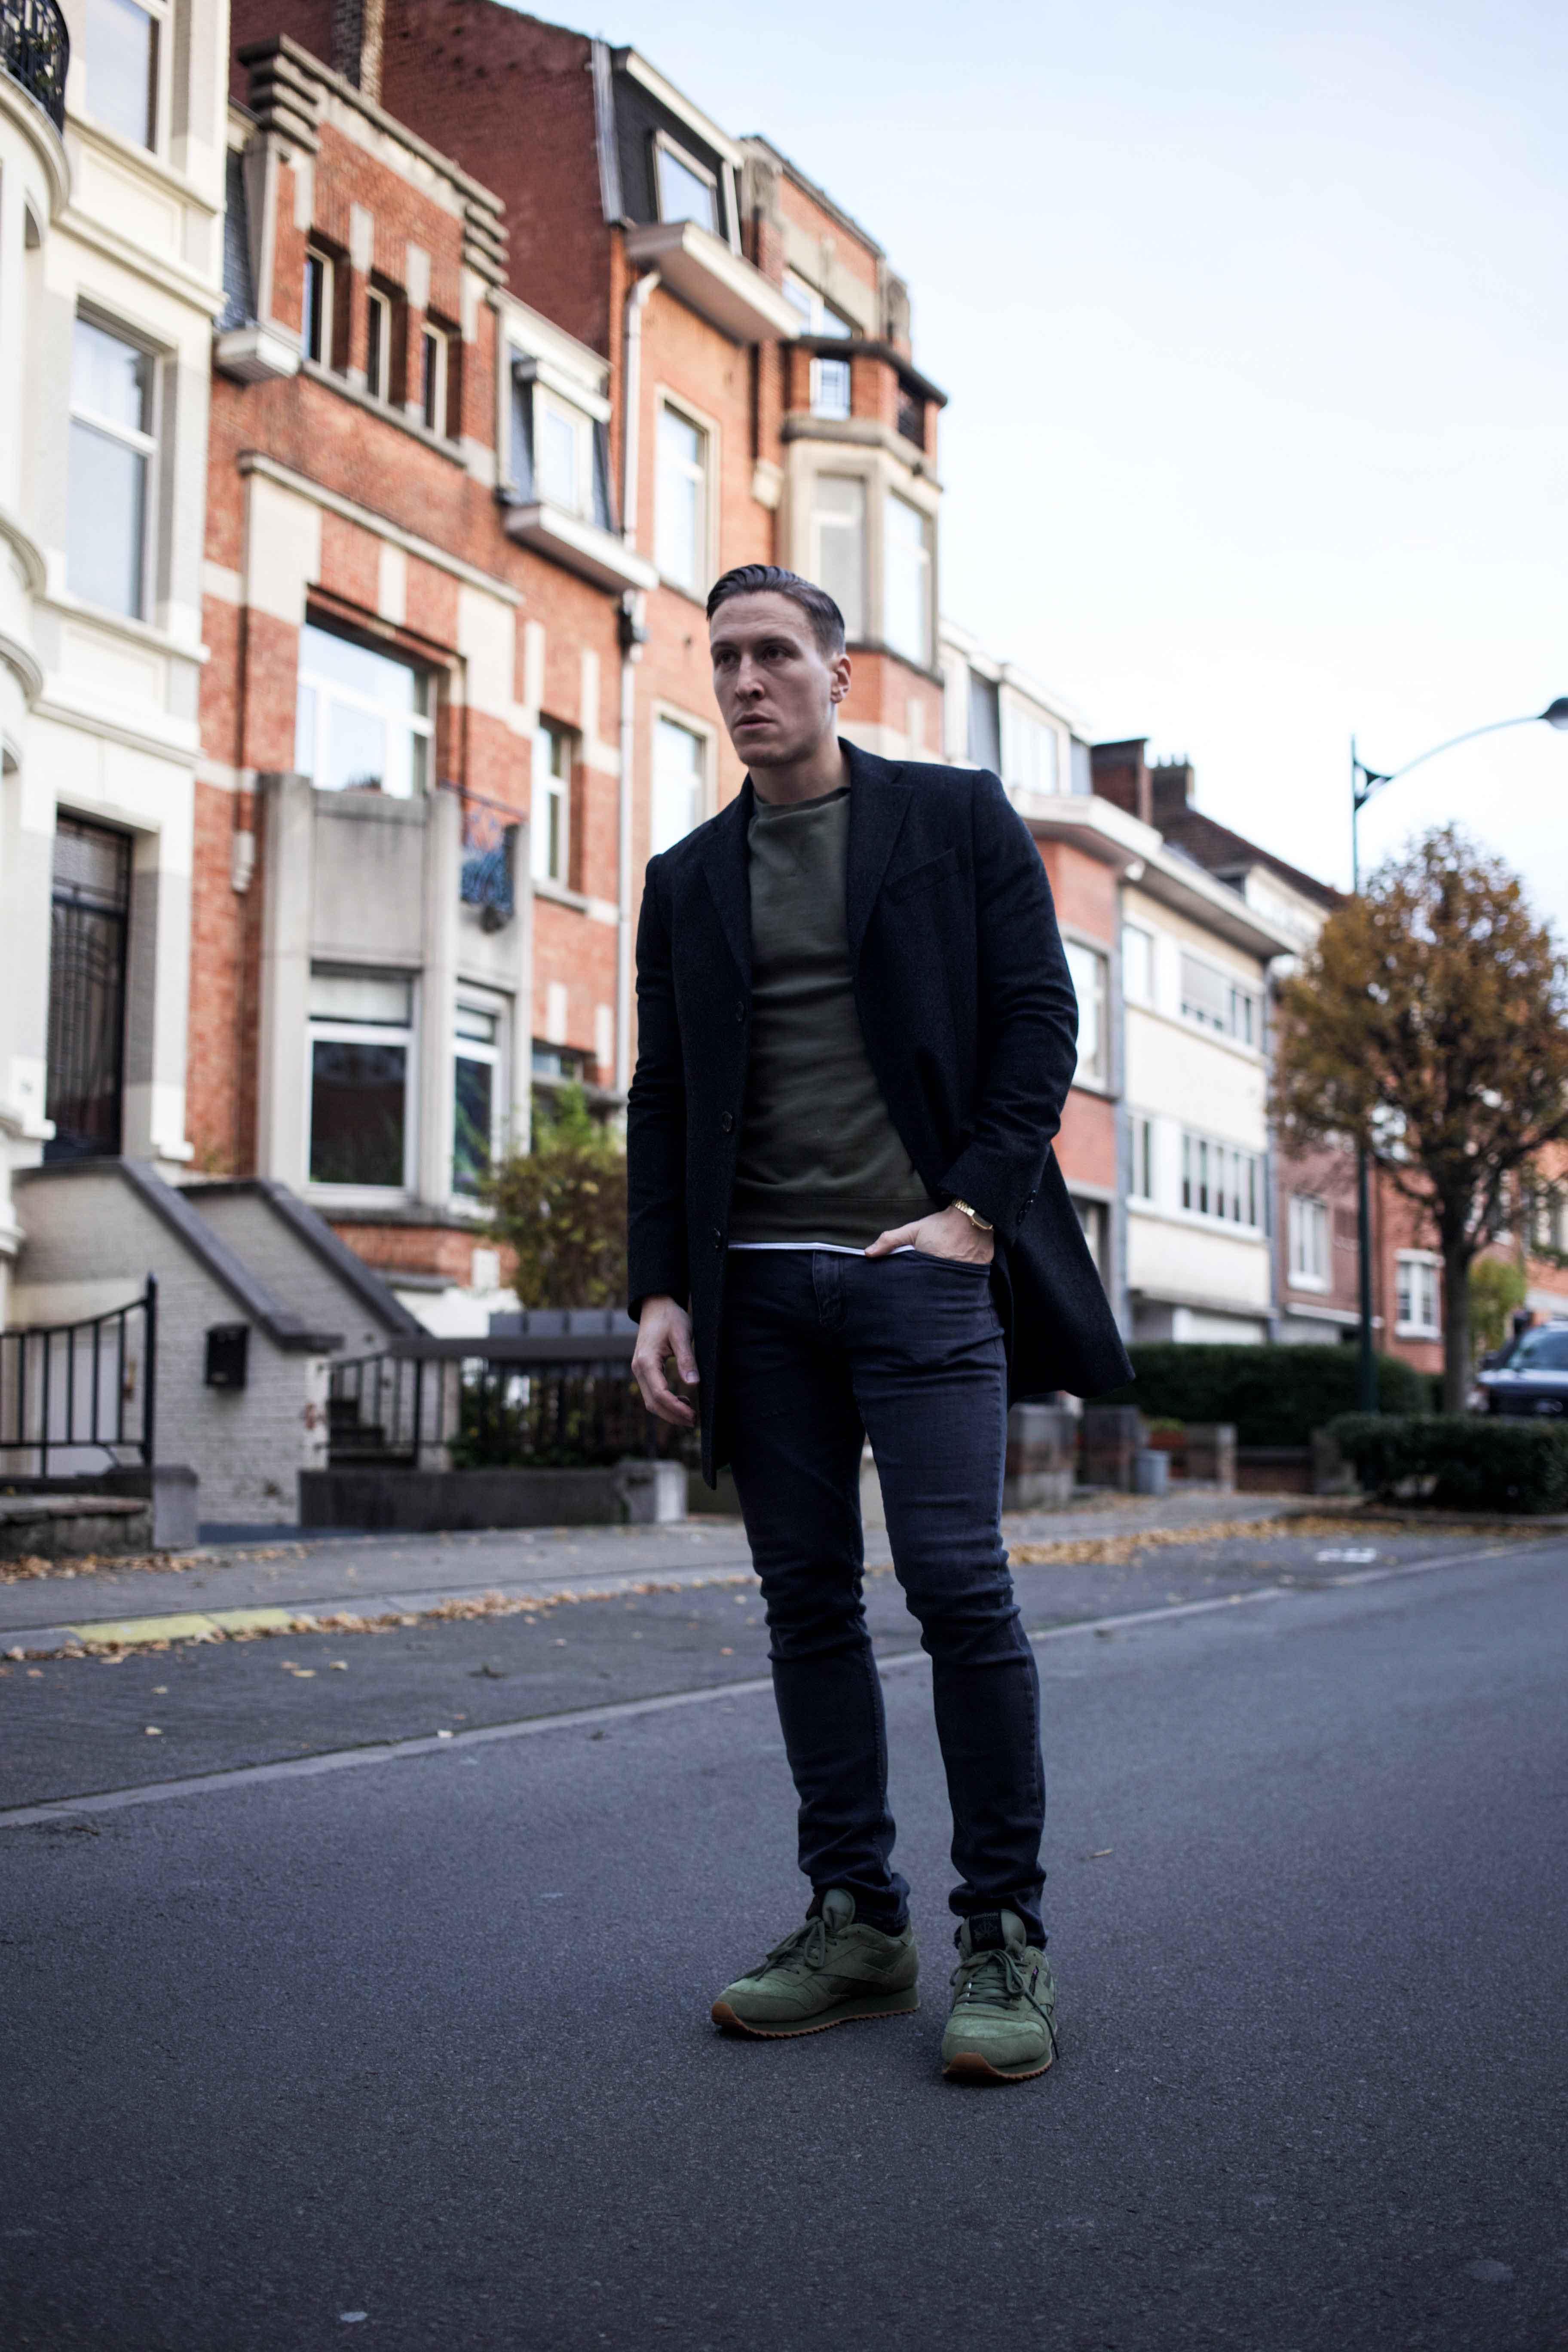 gruener-sweater-gruene-sneaker-modern-street-style-look-casio-uhr-modeblog-maennermode-berlin_8487